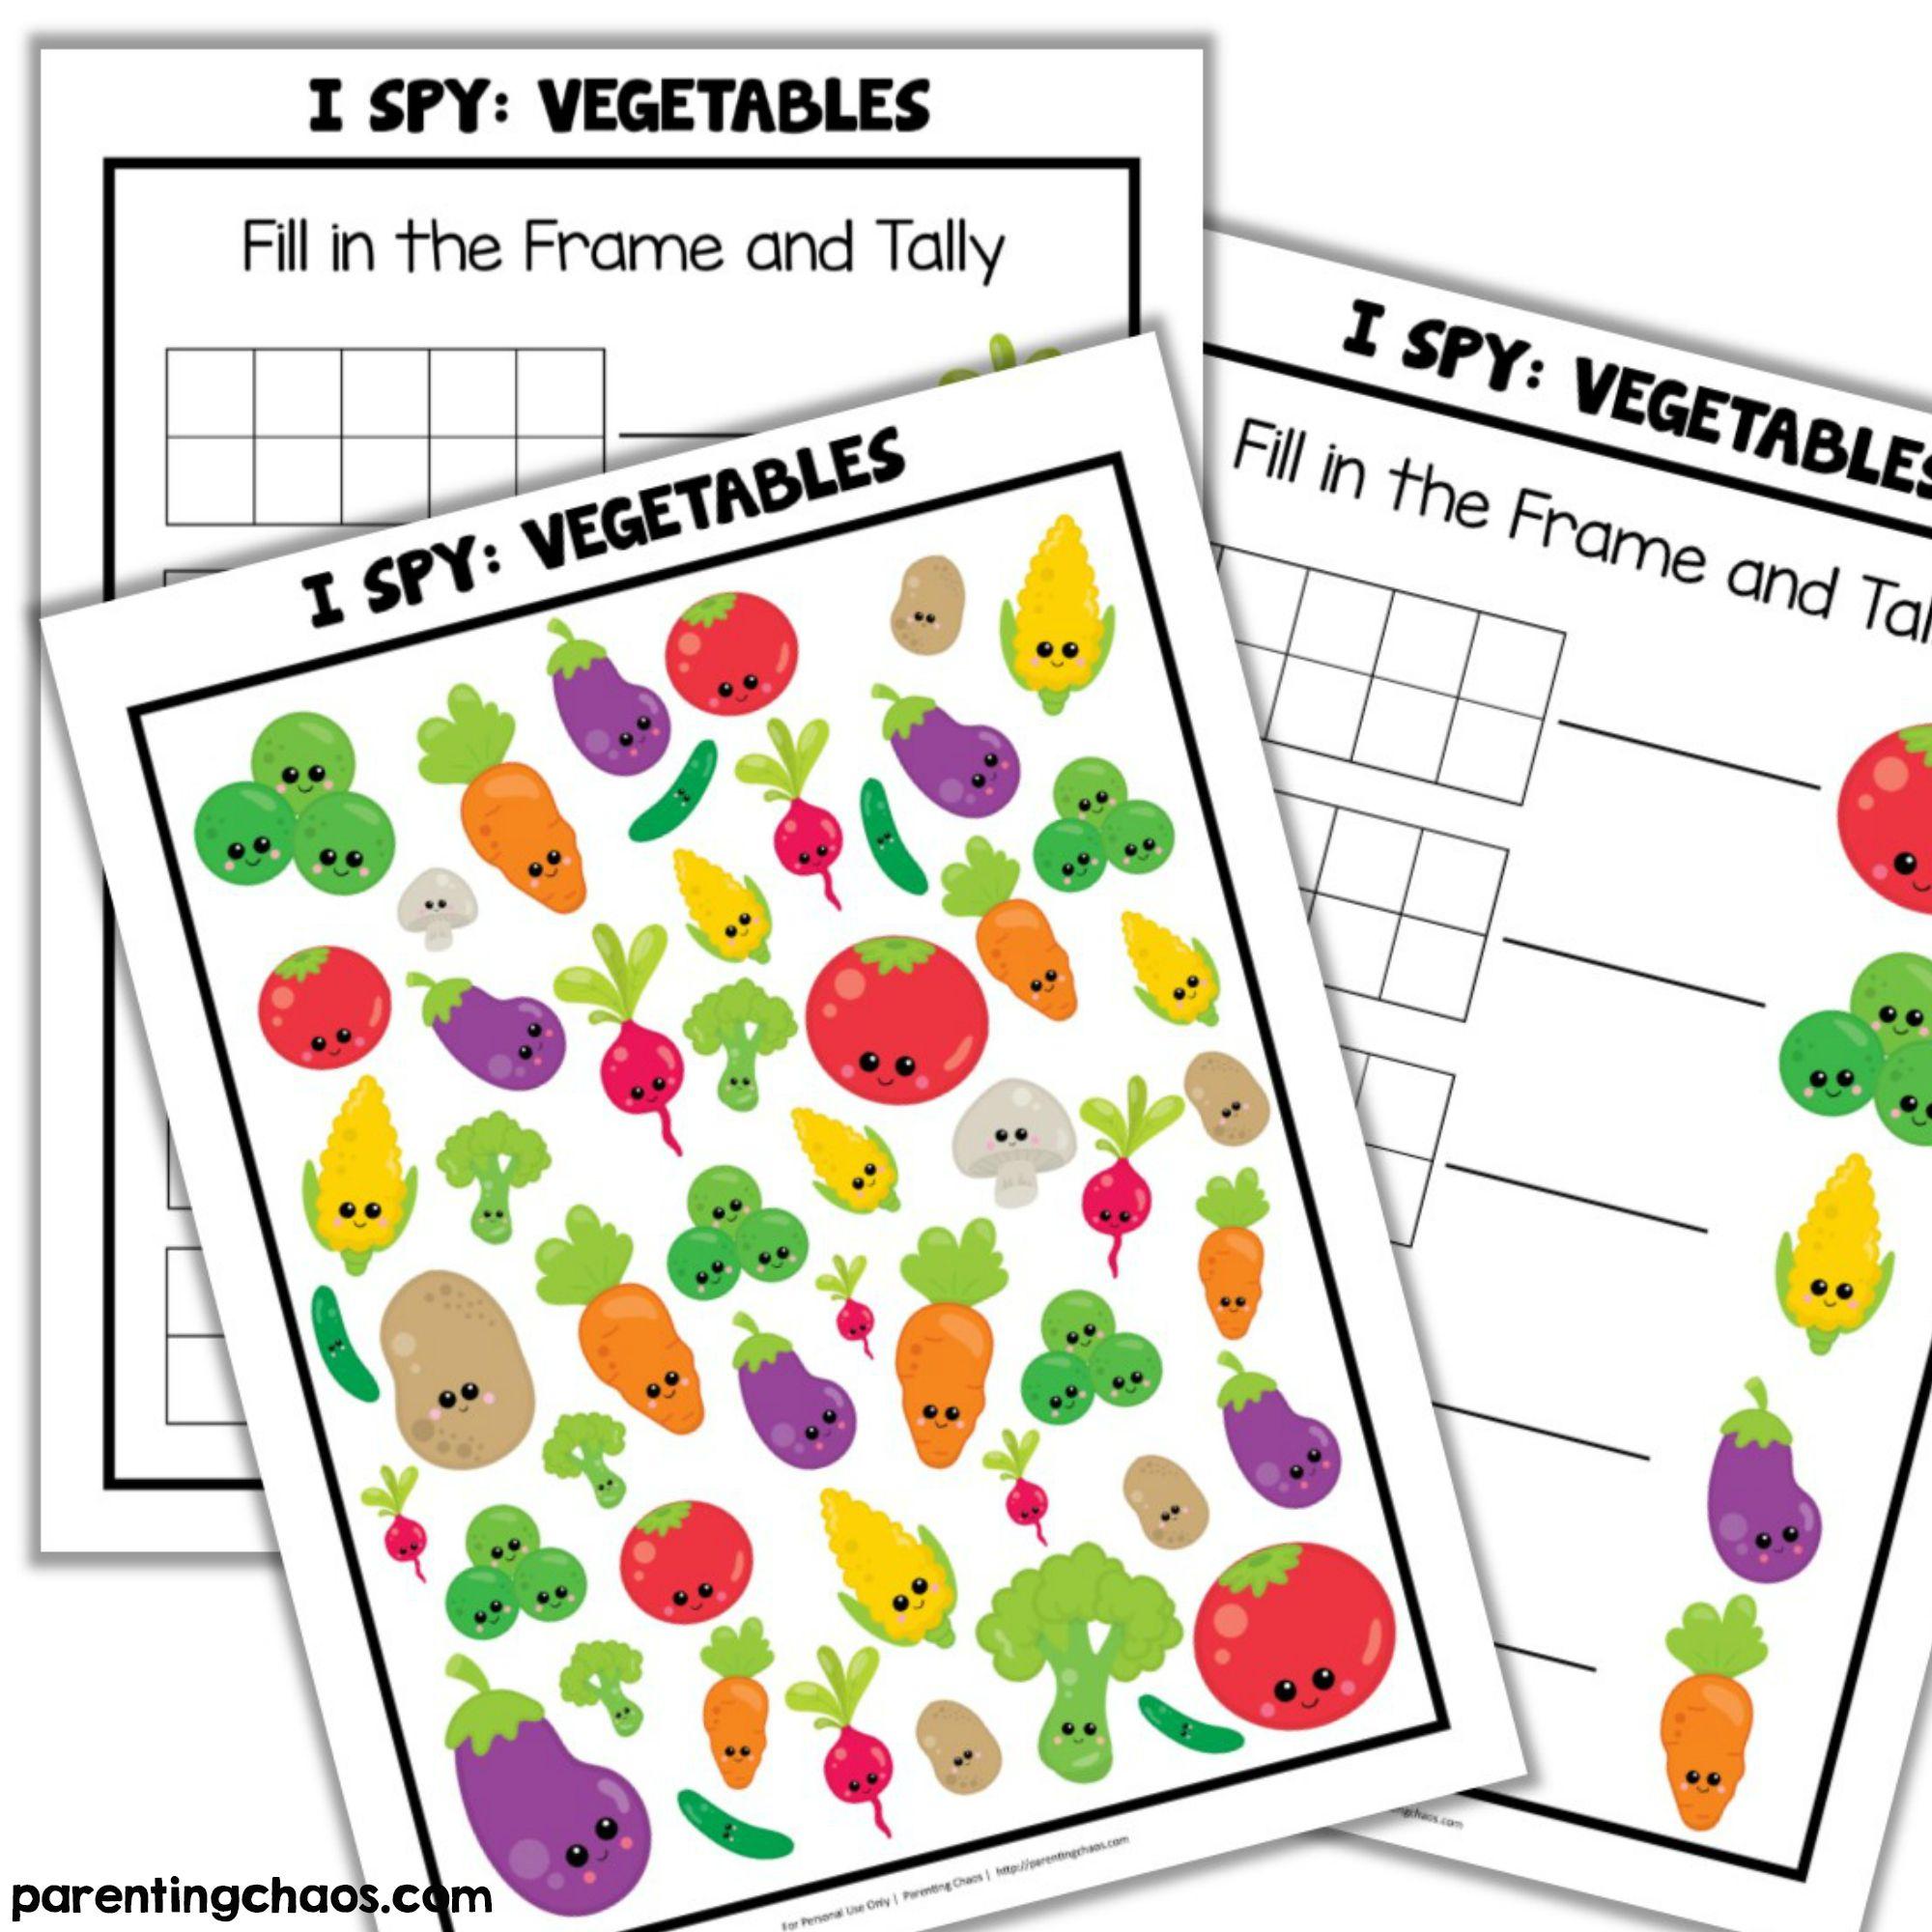 Vegetables I Spy Printable